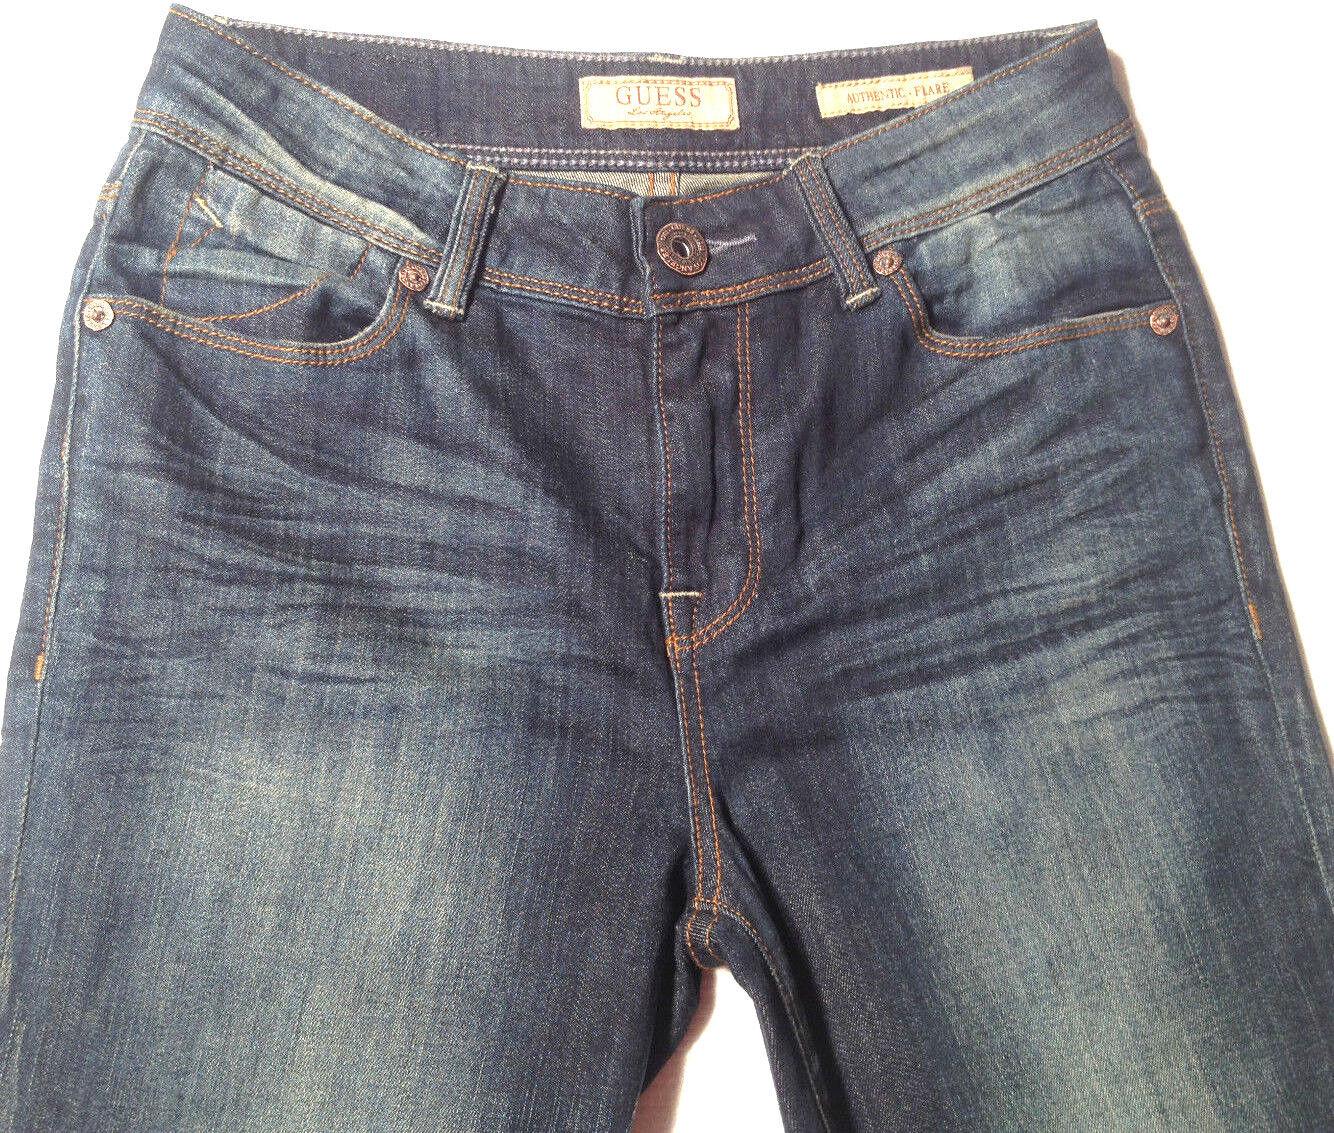 Guess Premium Jeans 'AUTHENTIC FLARE' W28 L34 AU10 Indigo NEW RRP  219 Womens